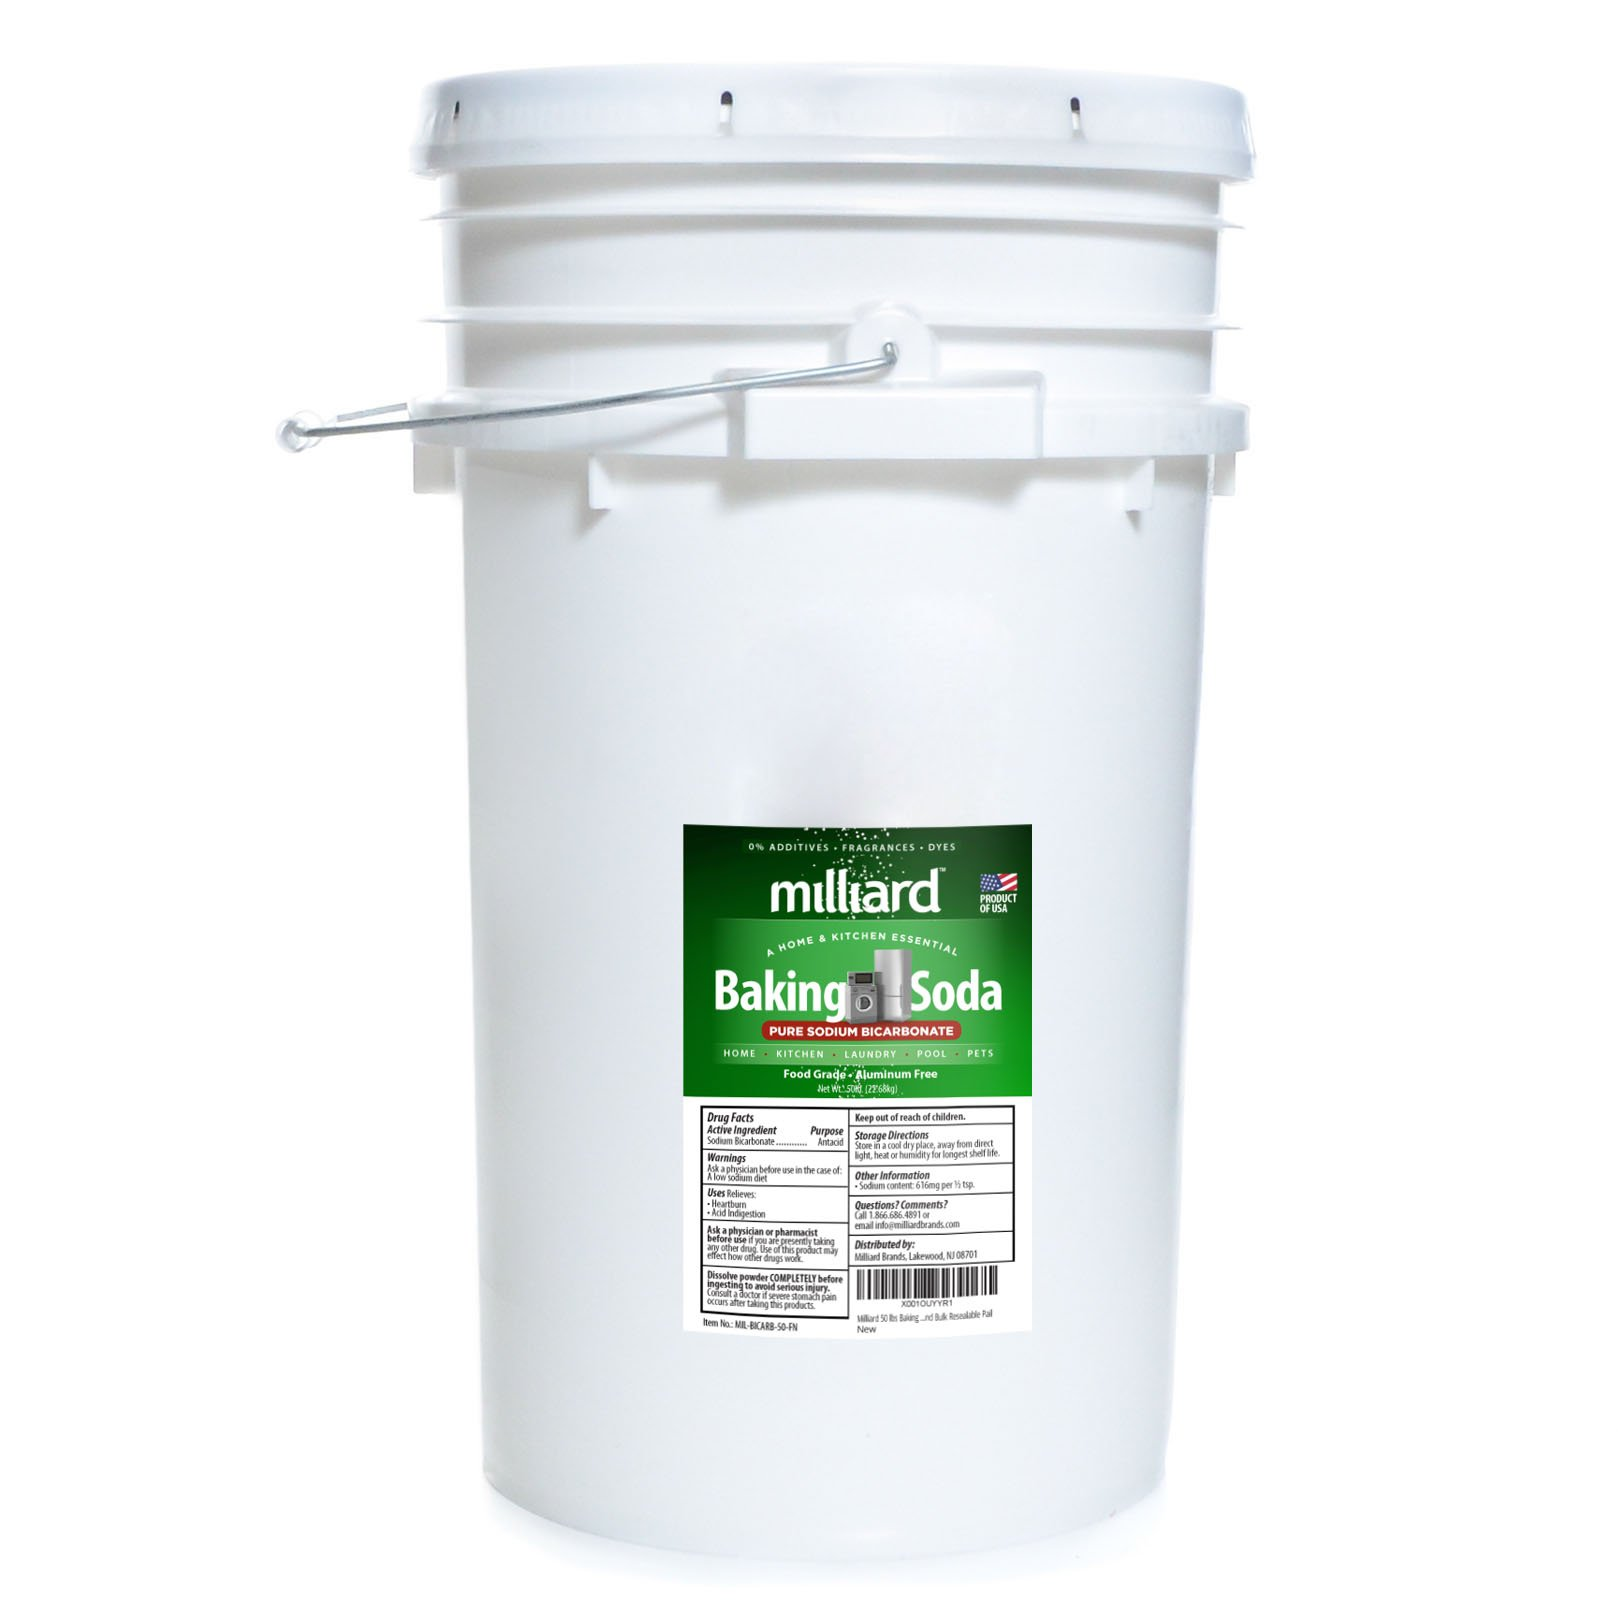 Milliard 50 lbs Baking Soda/Sodium Bicarbonate USP - 50 Pound Bulk Resealable Pail